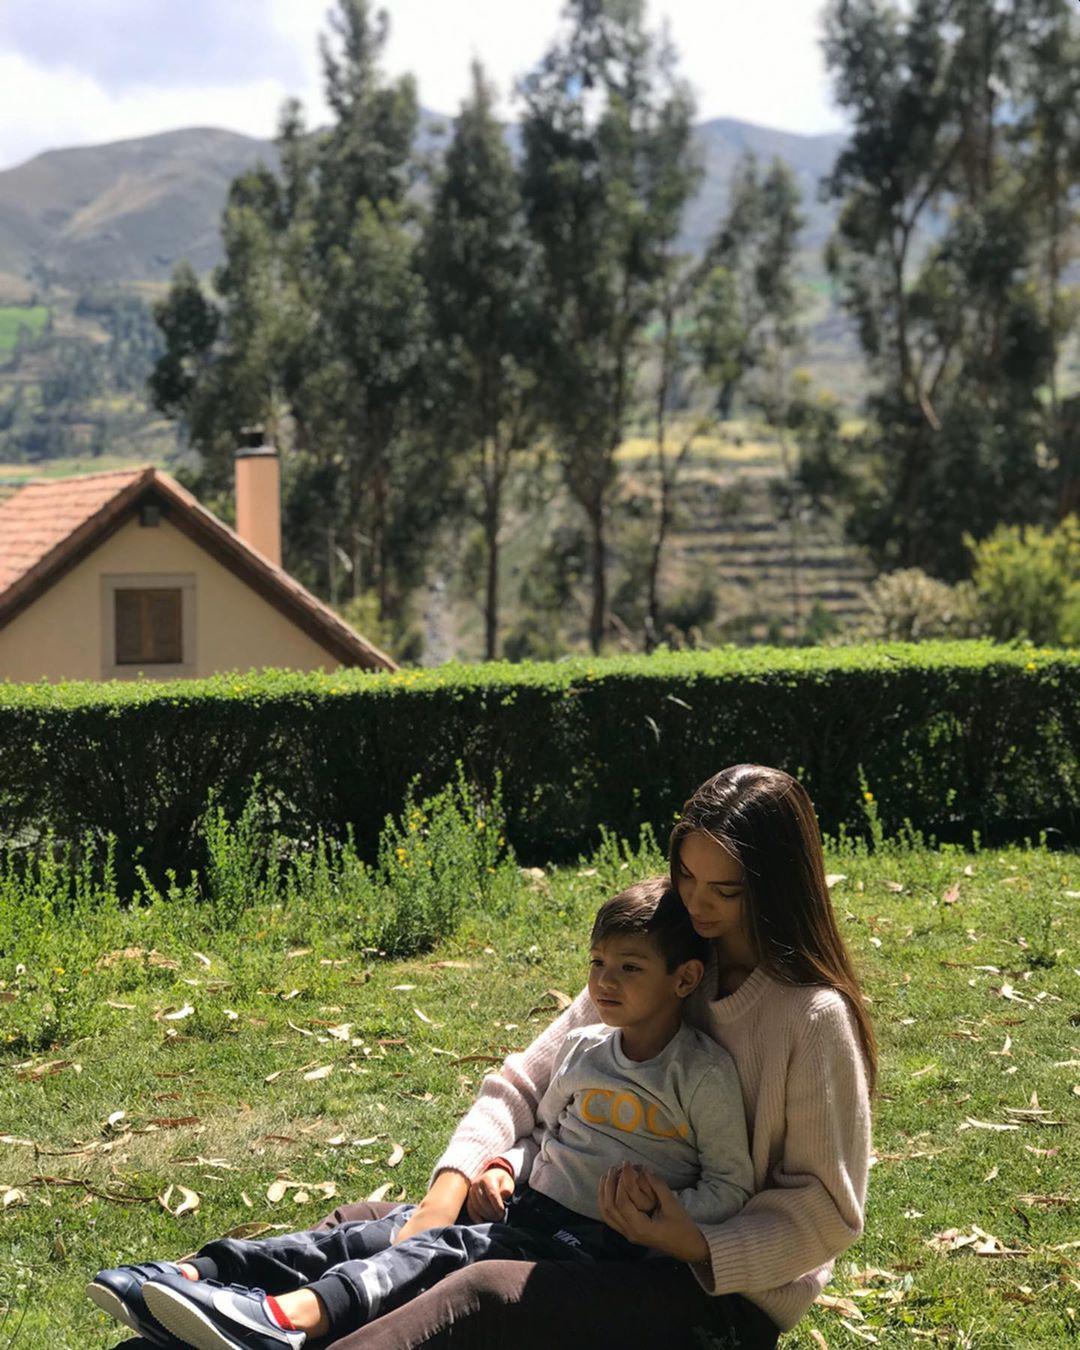 natalie vertiz, miss peru universe 2011. particpo de nb latina 2010 & latin model 2010 (season 3). - Página 16 94879010